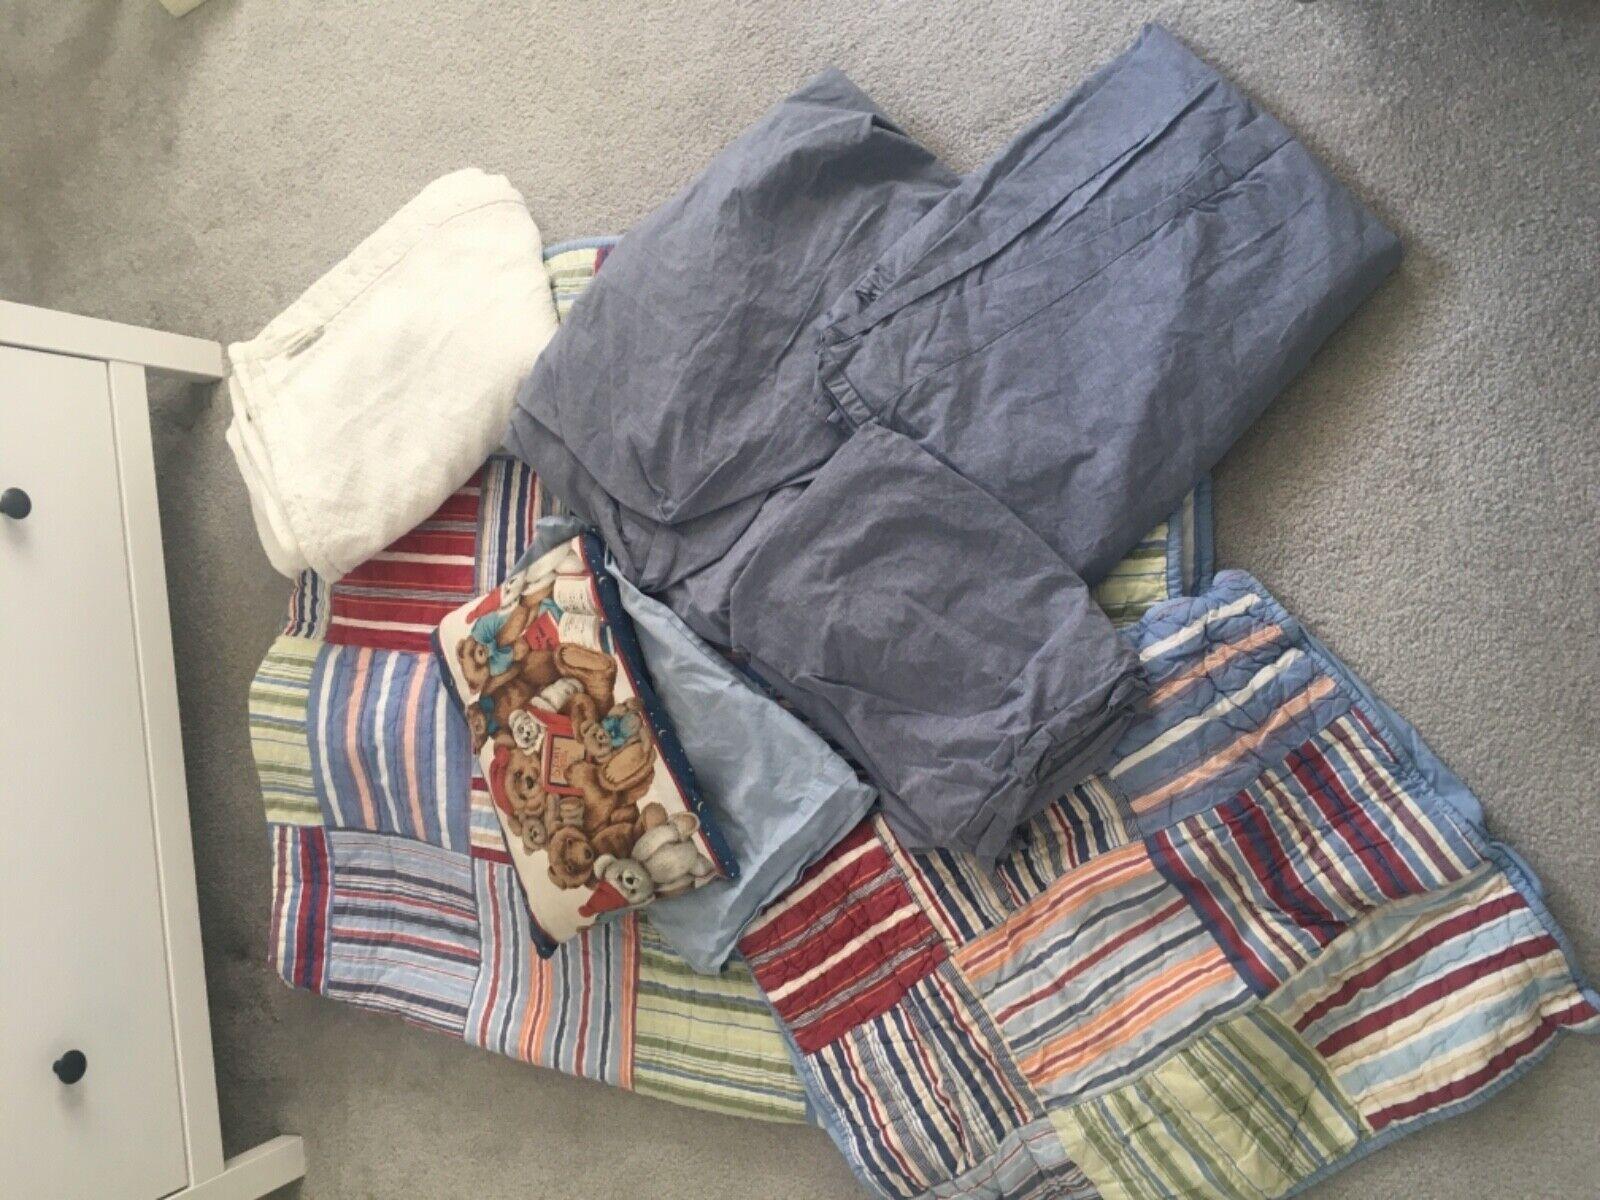 Pottery Barn Kids PBK 4 pc Boys Madras bluee Twin Quilt Sham Blanket Sheet Set